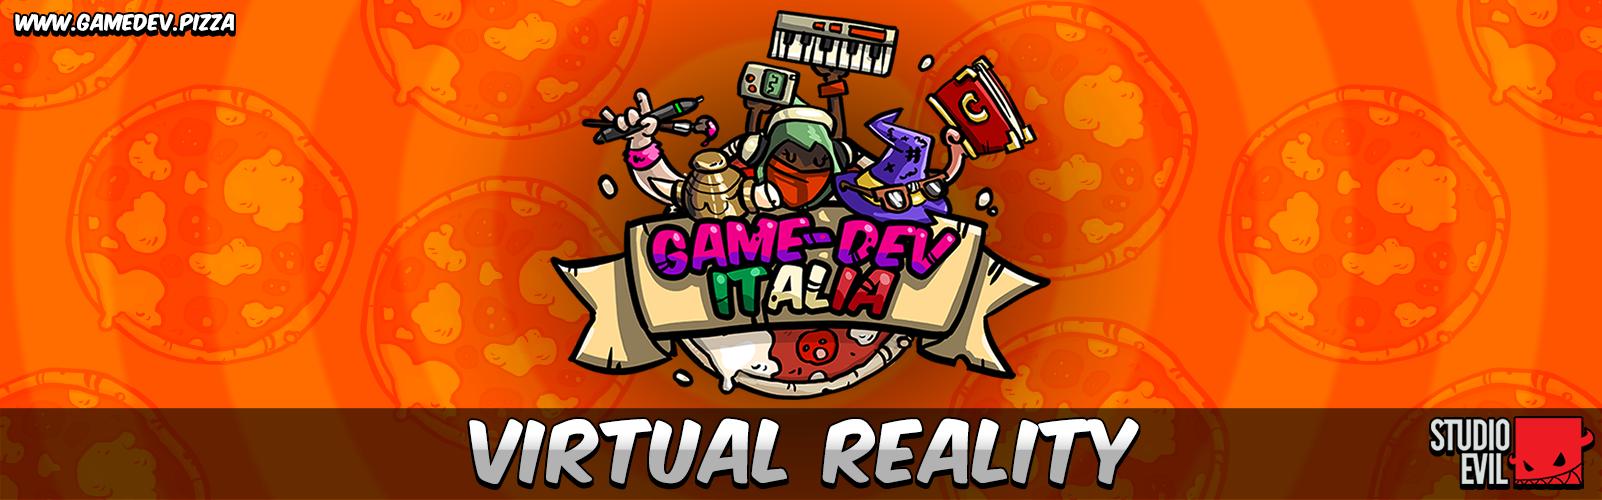 gamedev_italia_banner__0005_vr